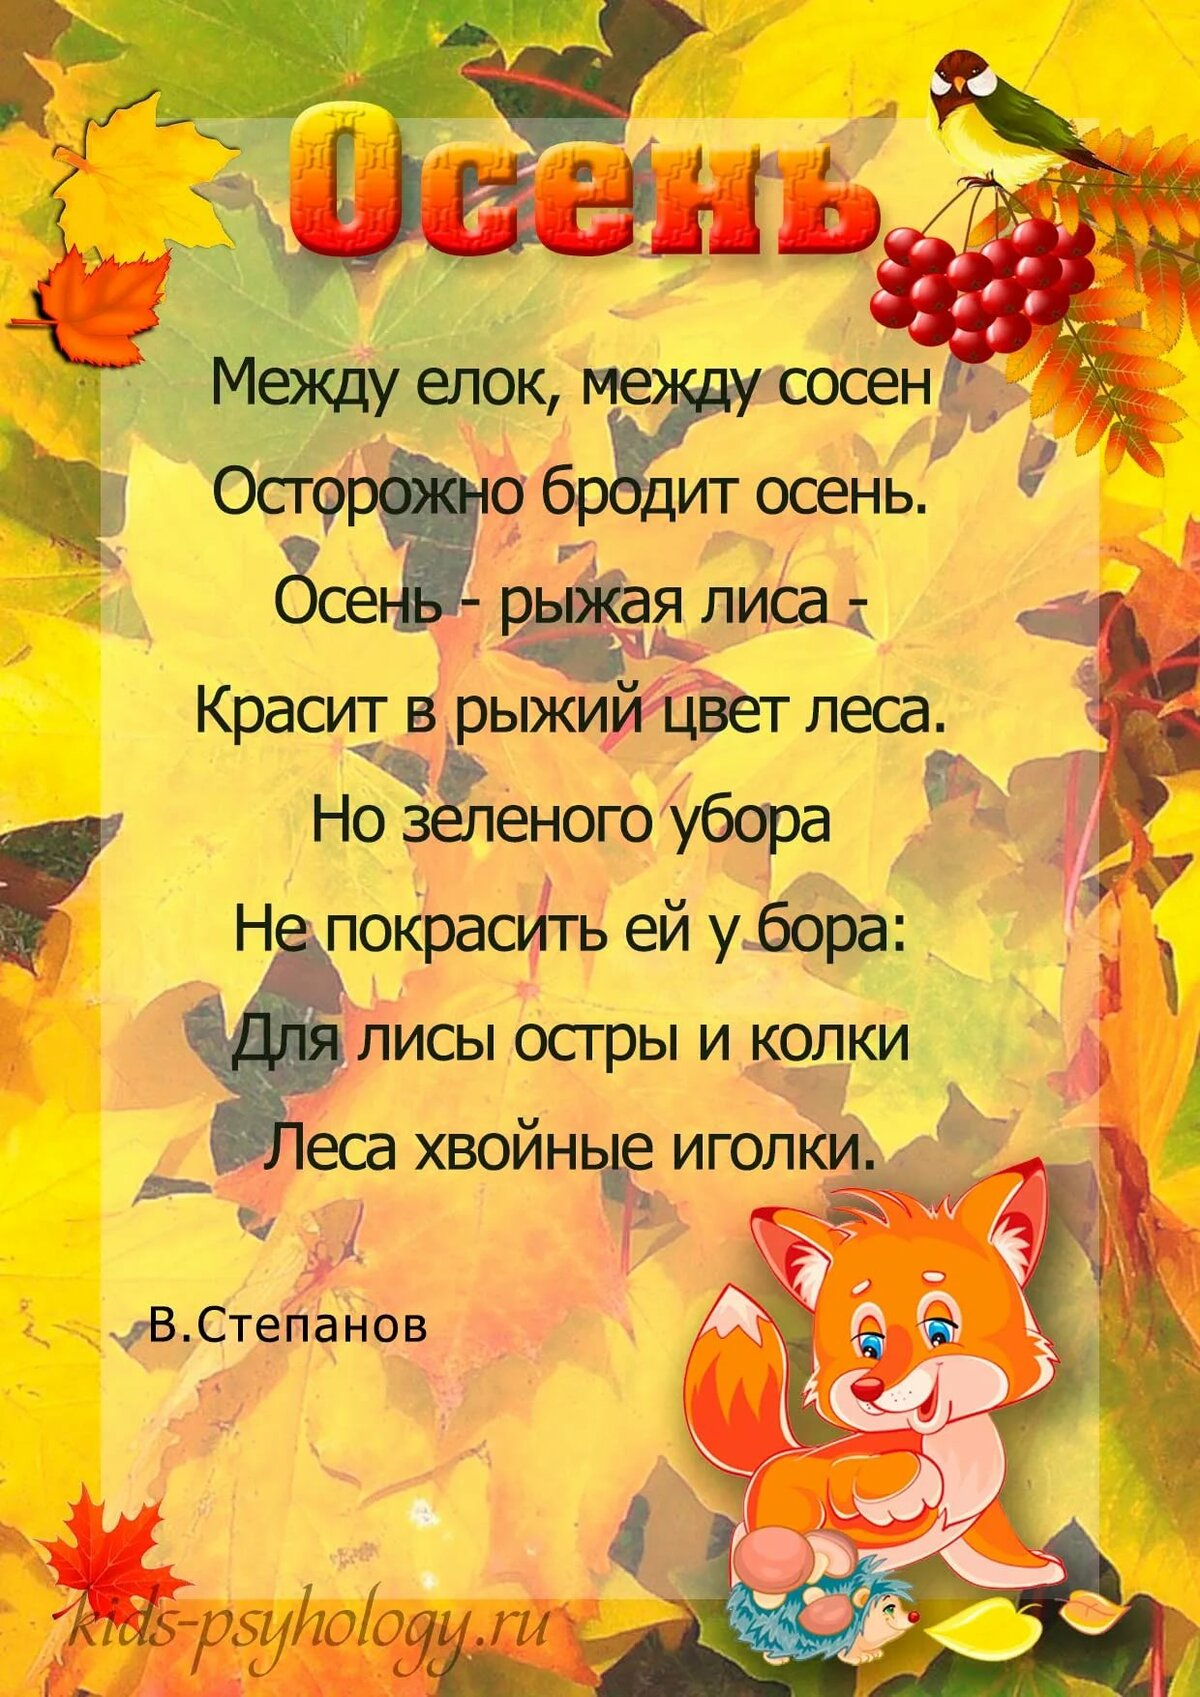 Открытки стихи о осени